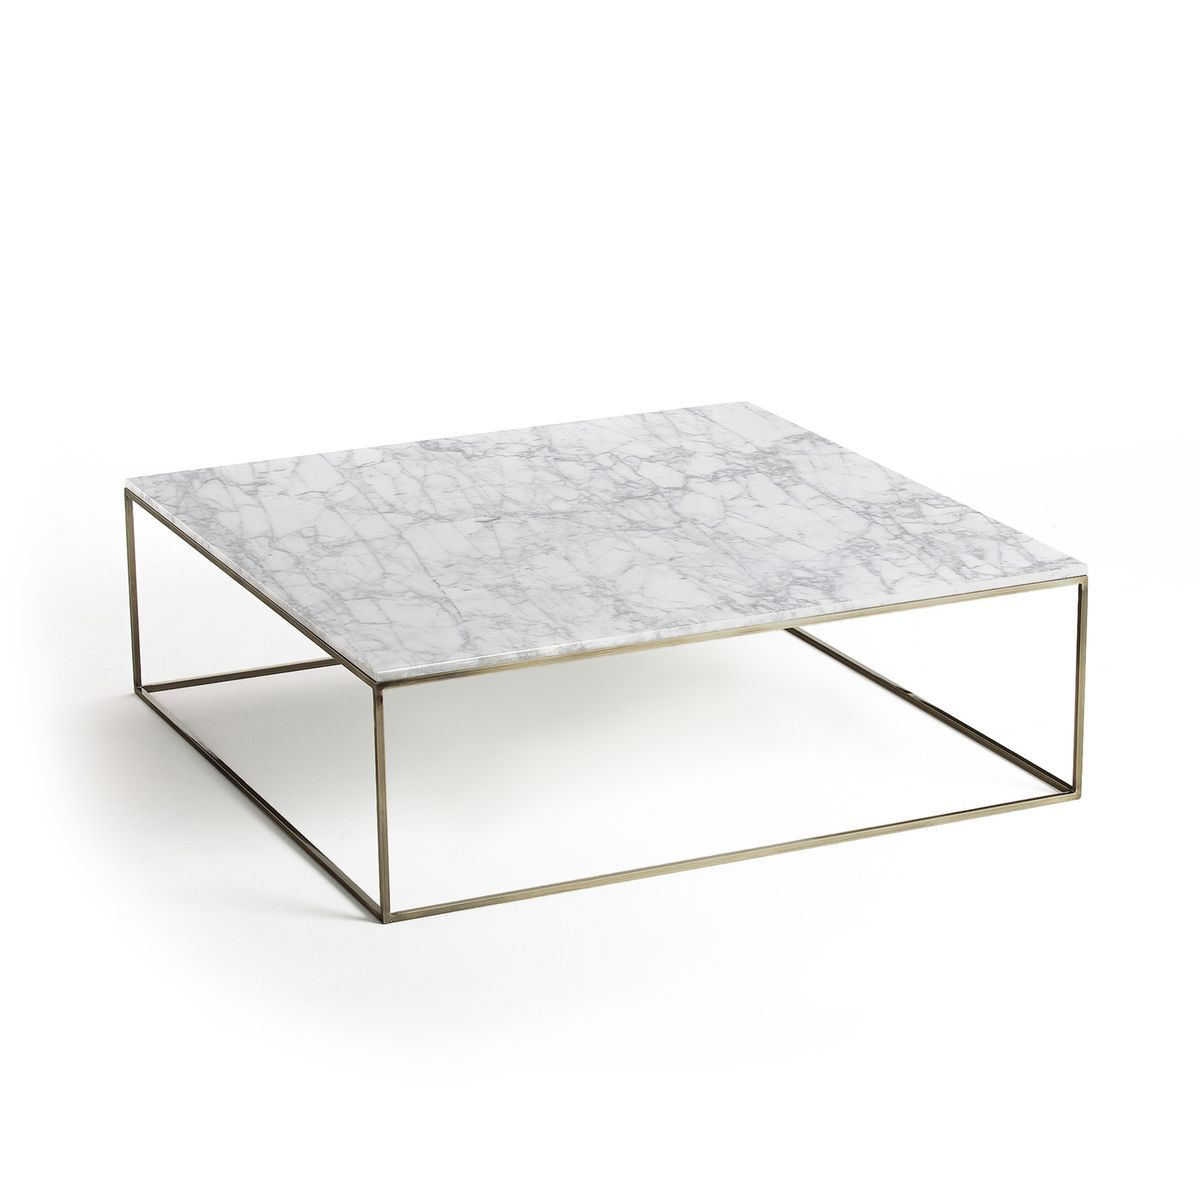 Table Basse Effet Laiton Vieilli Marbre Mahaut Table Basse Table Basse Marbre Table Basse Moderne